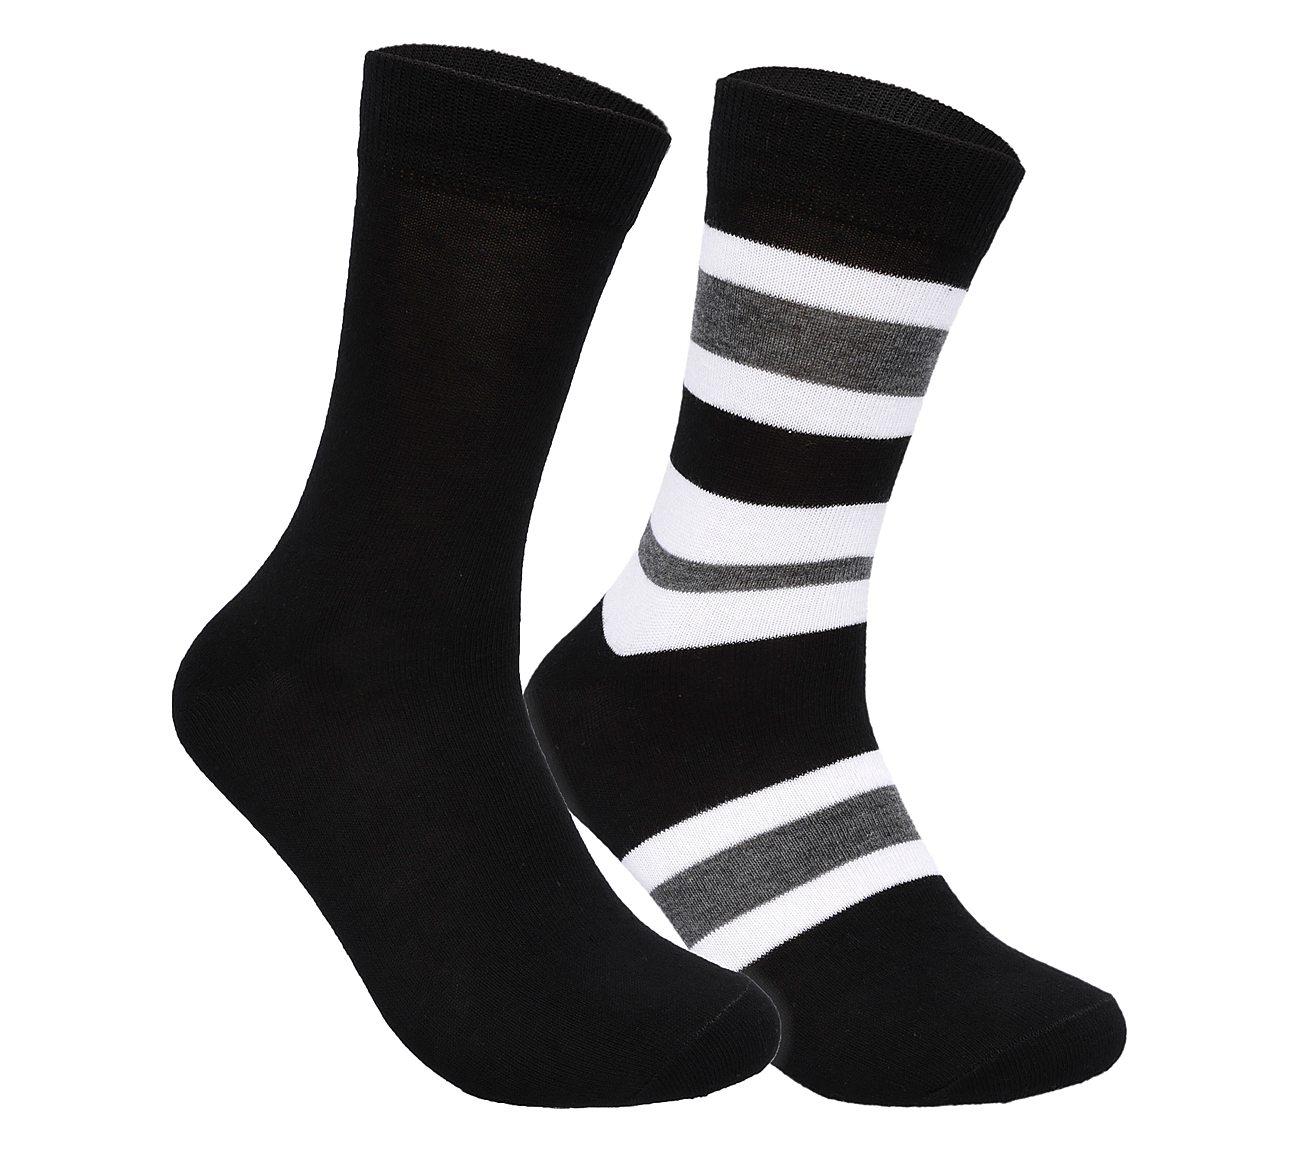 2 Pack Super Soft Crew Socks